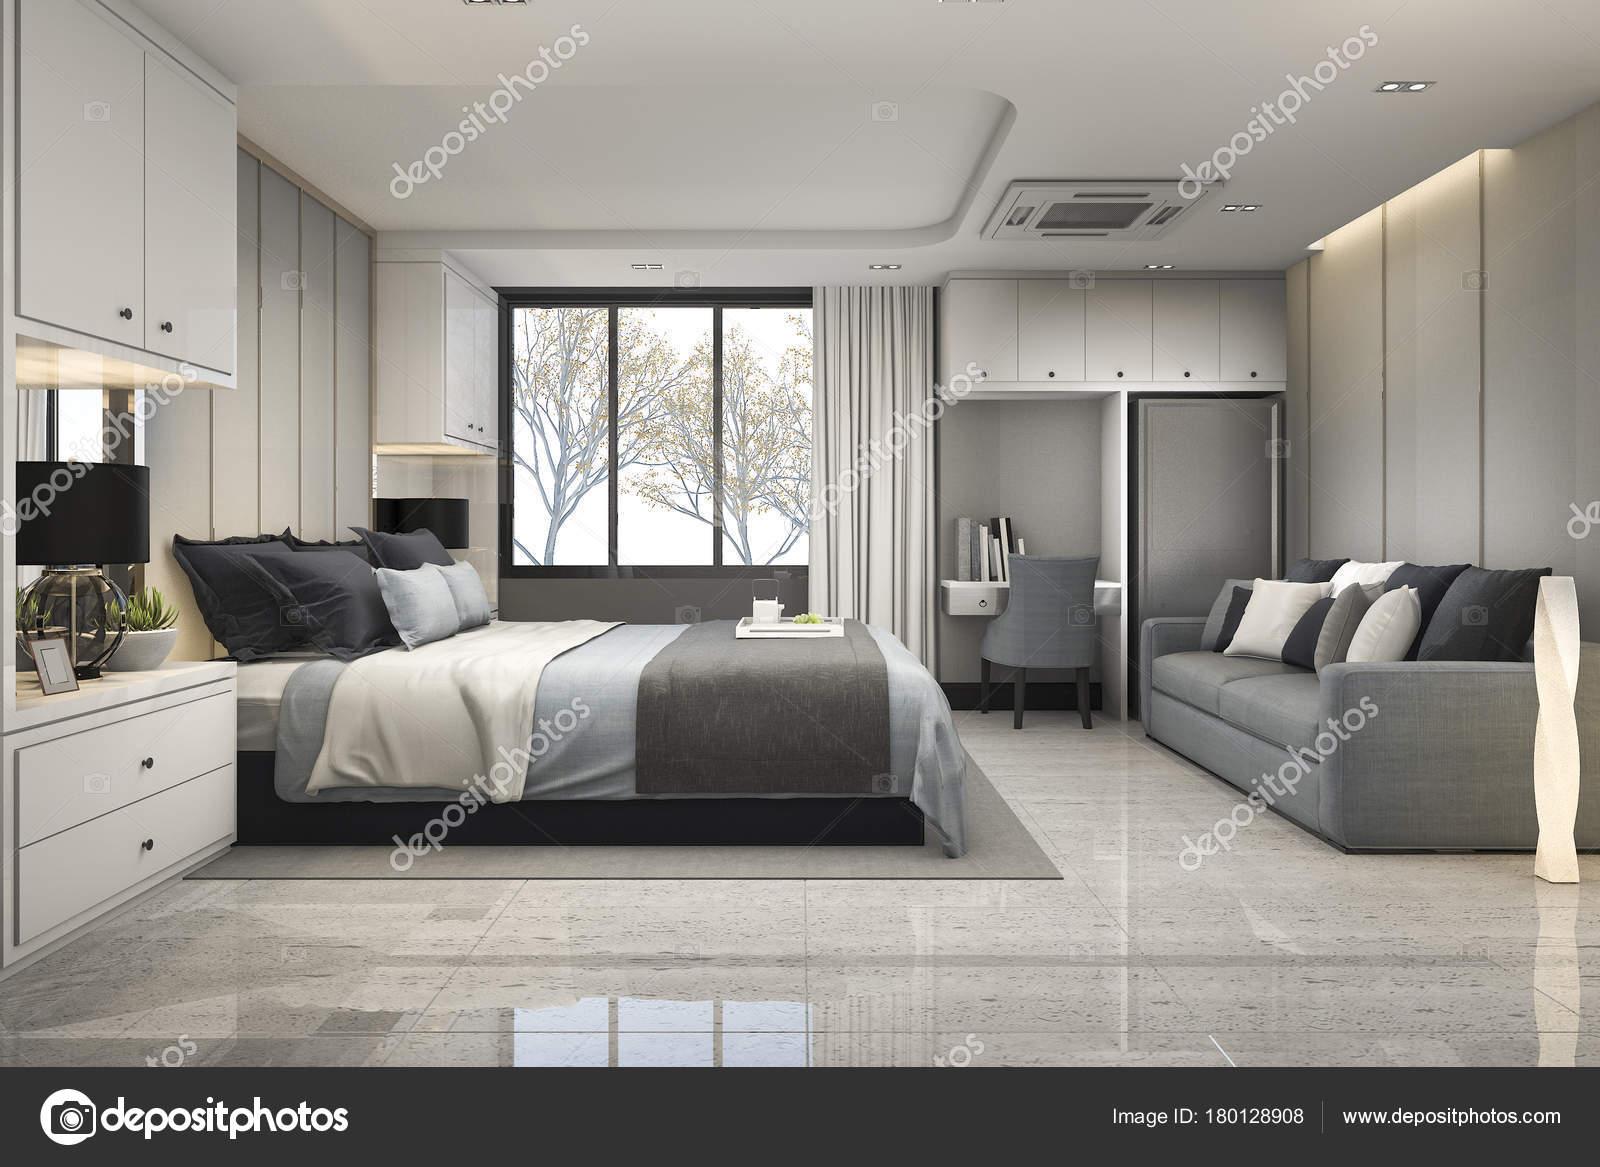 Chambre De Luxe Moderne Bleu Rendu 3D Avec Un Décor En Marbreu2013 Images De  Stock Libres De Droits